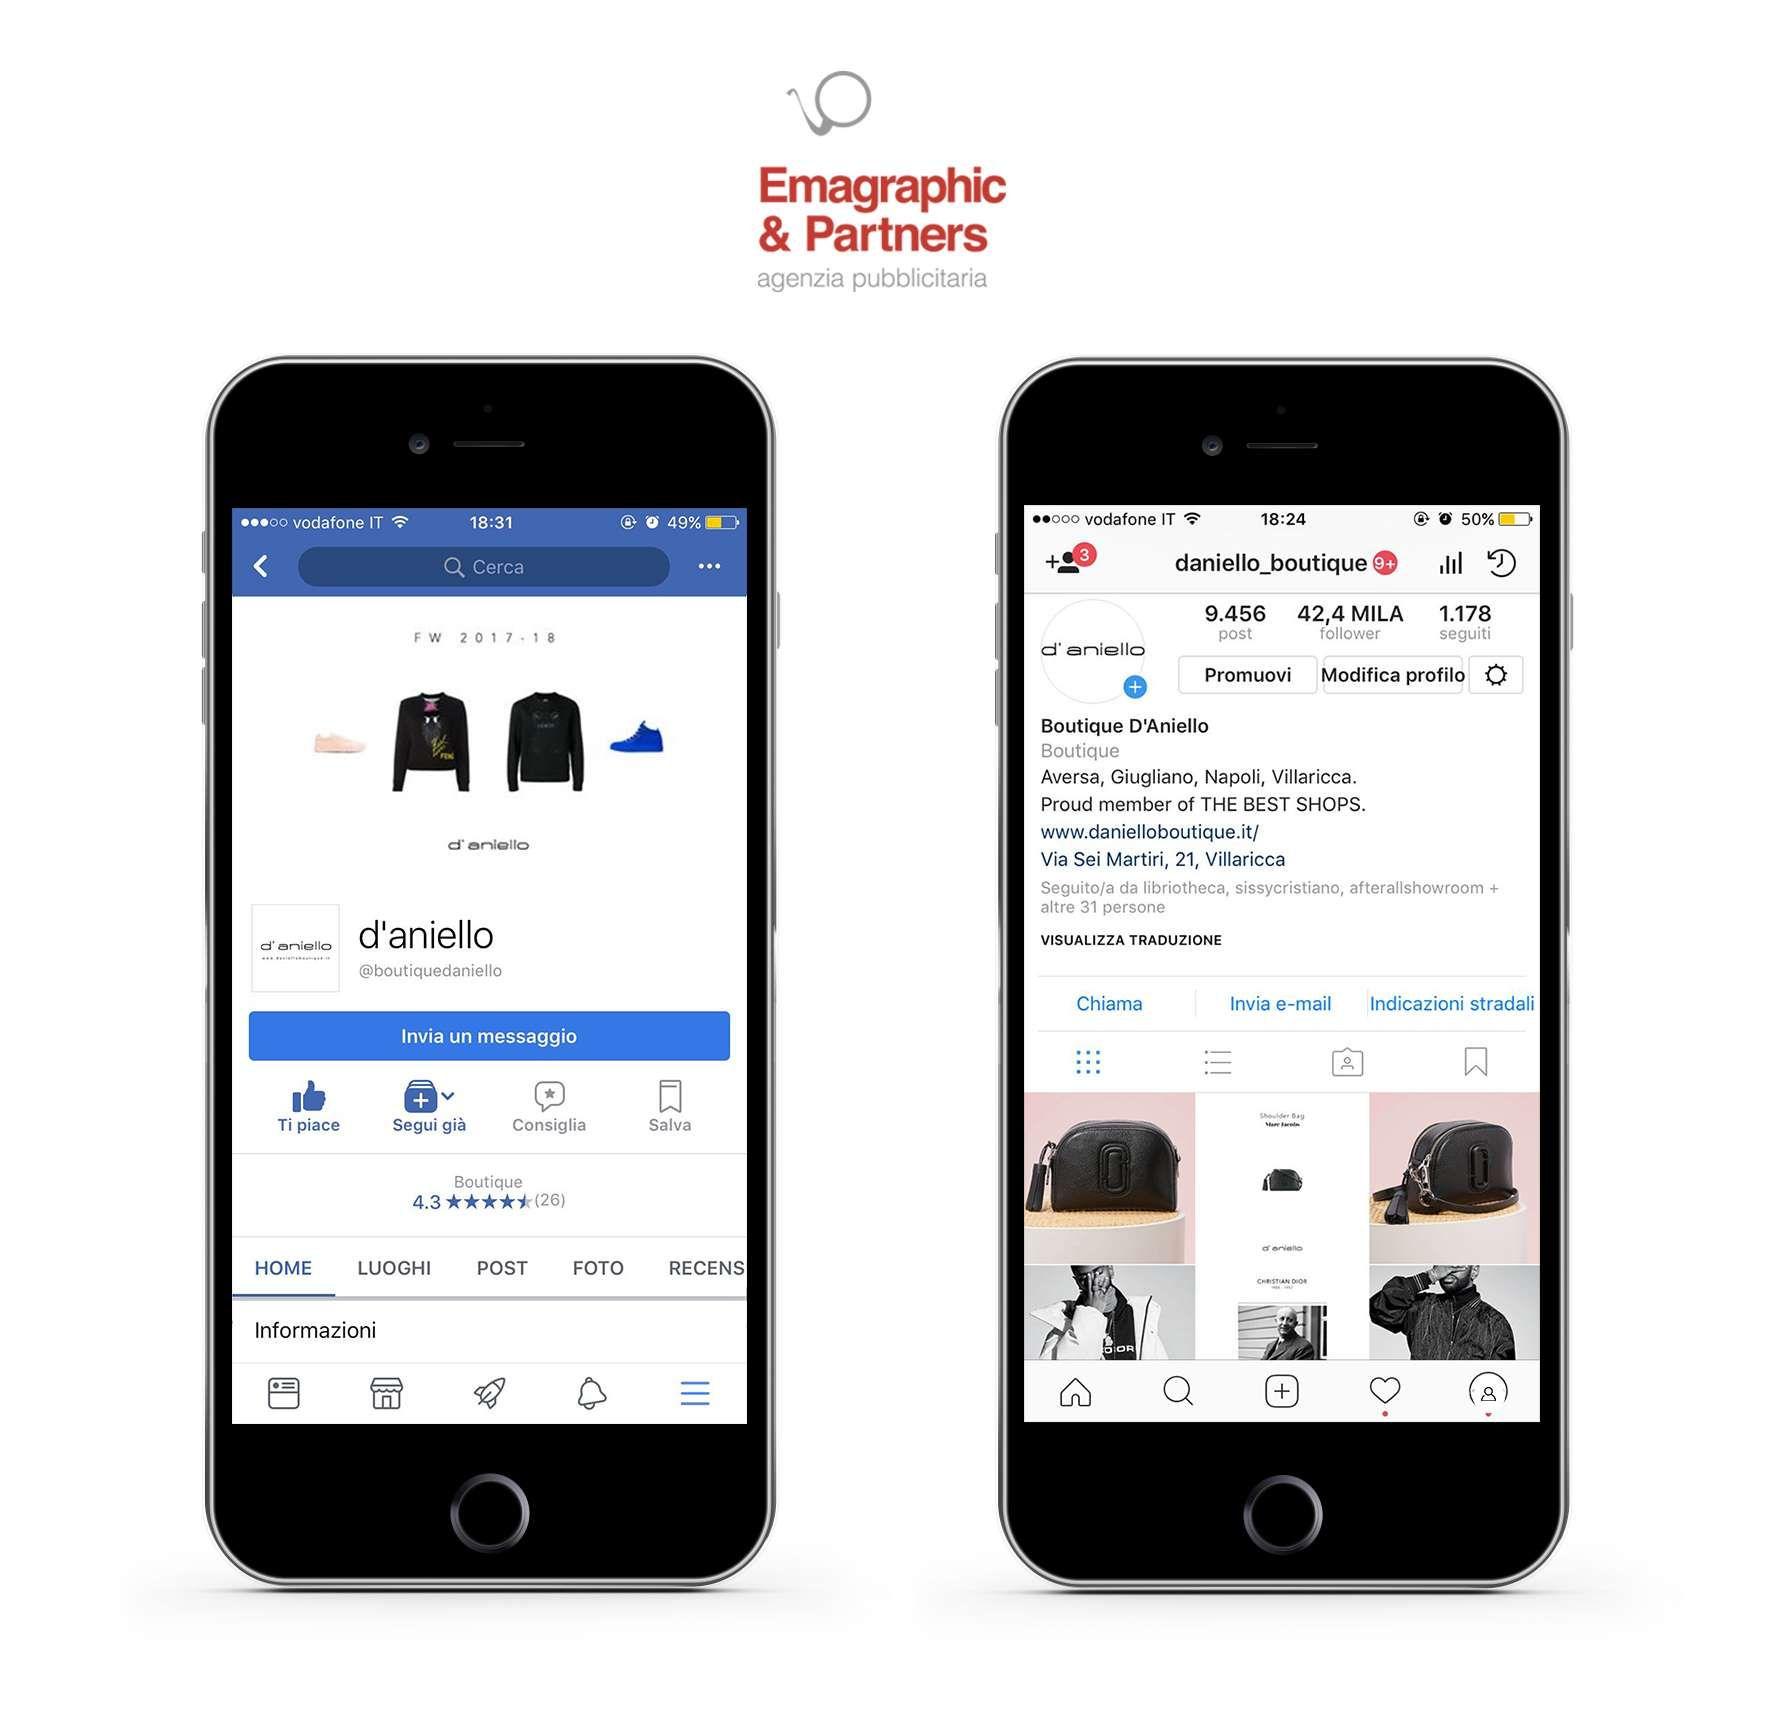 gestione-social-media-marketing-d-aniello